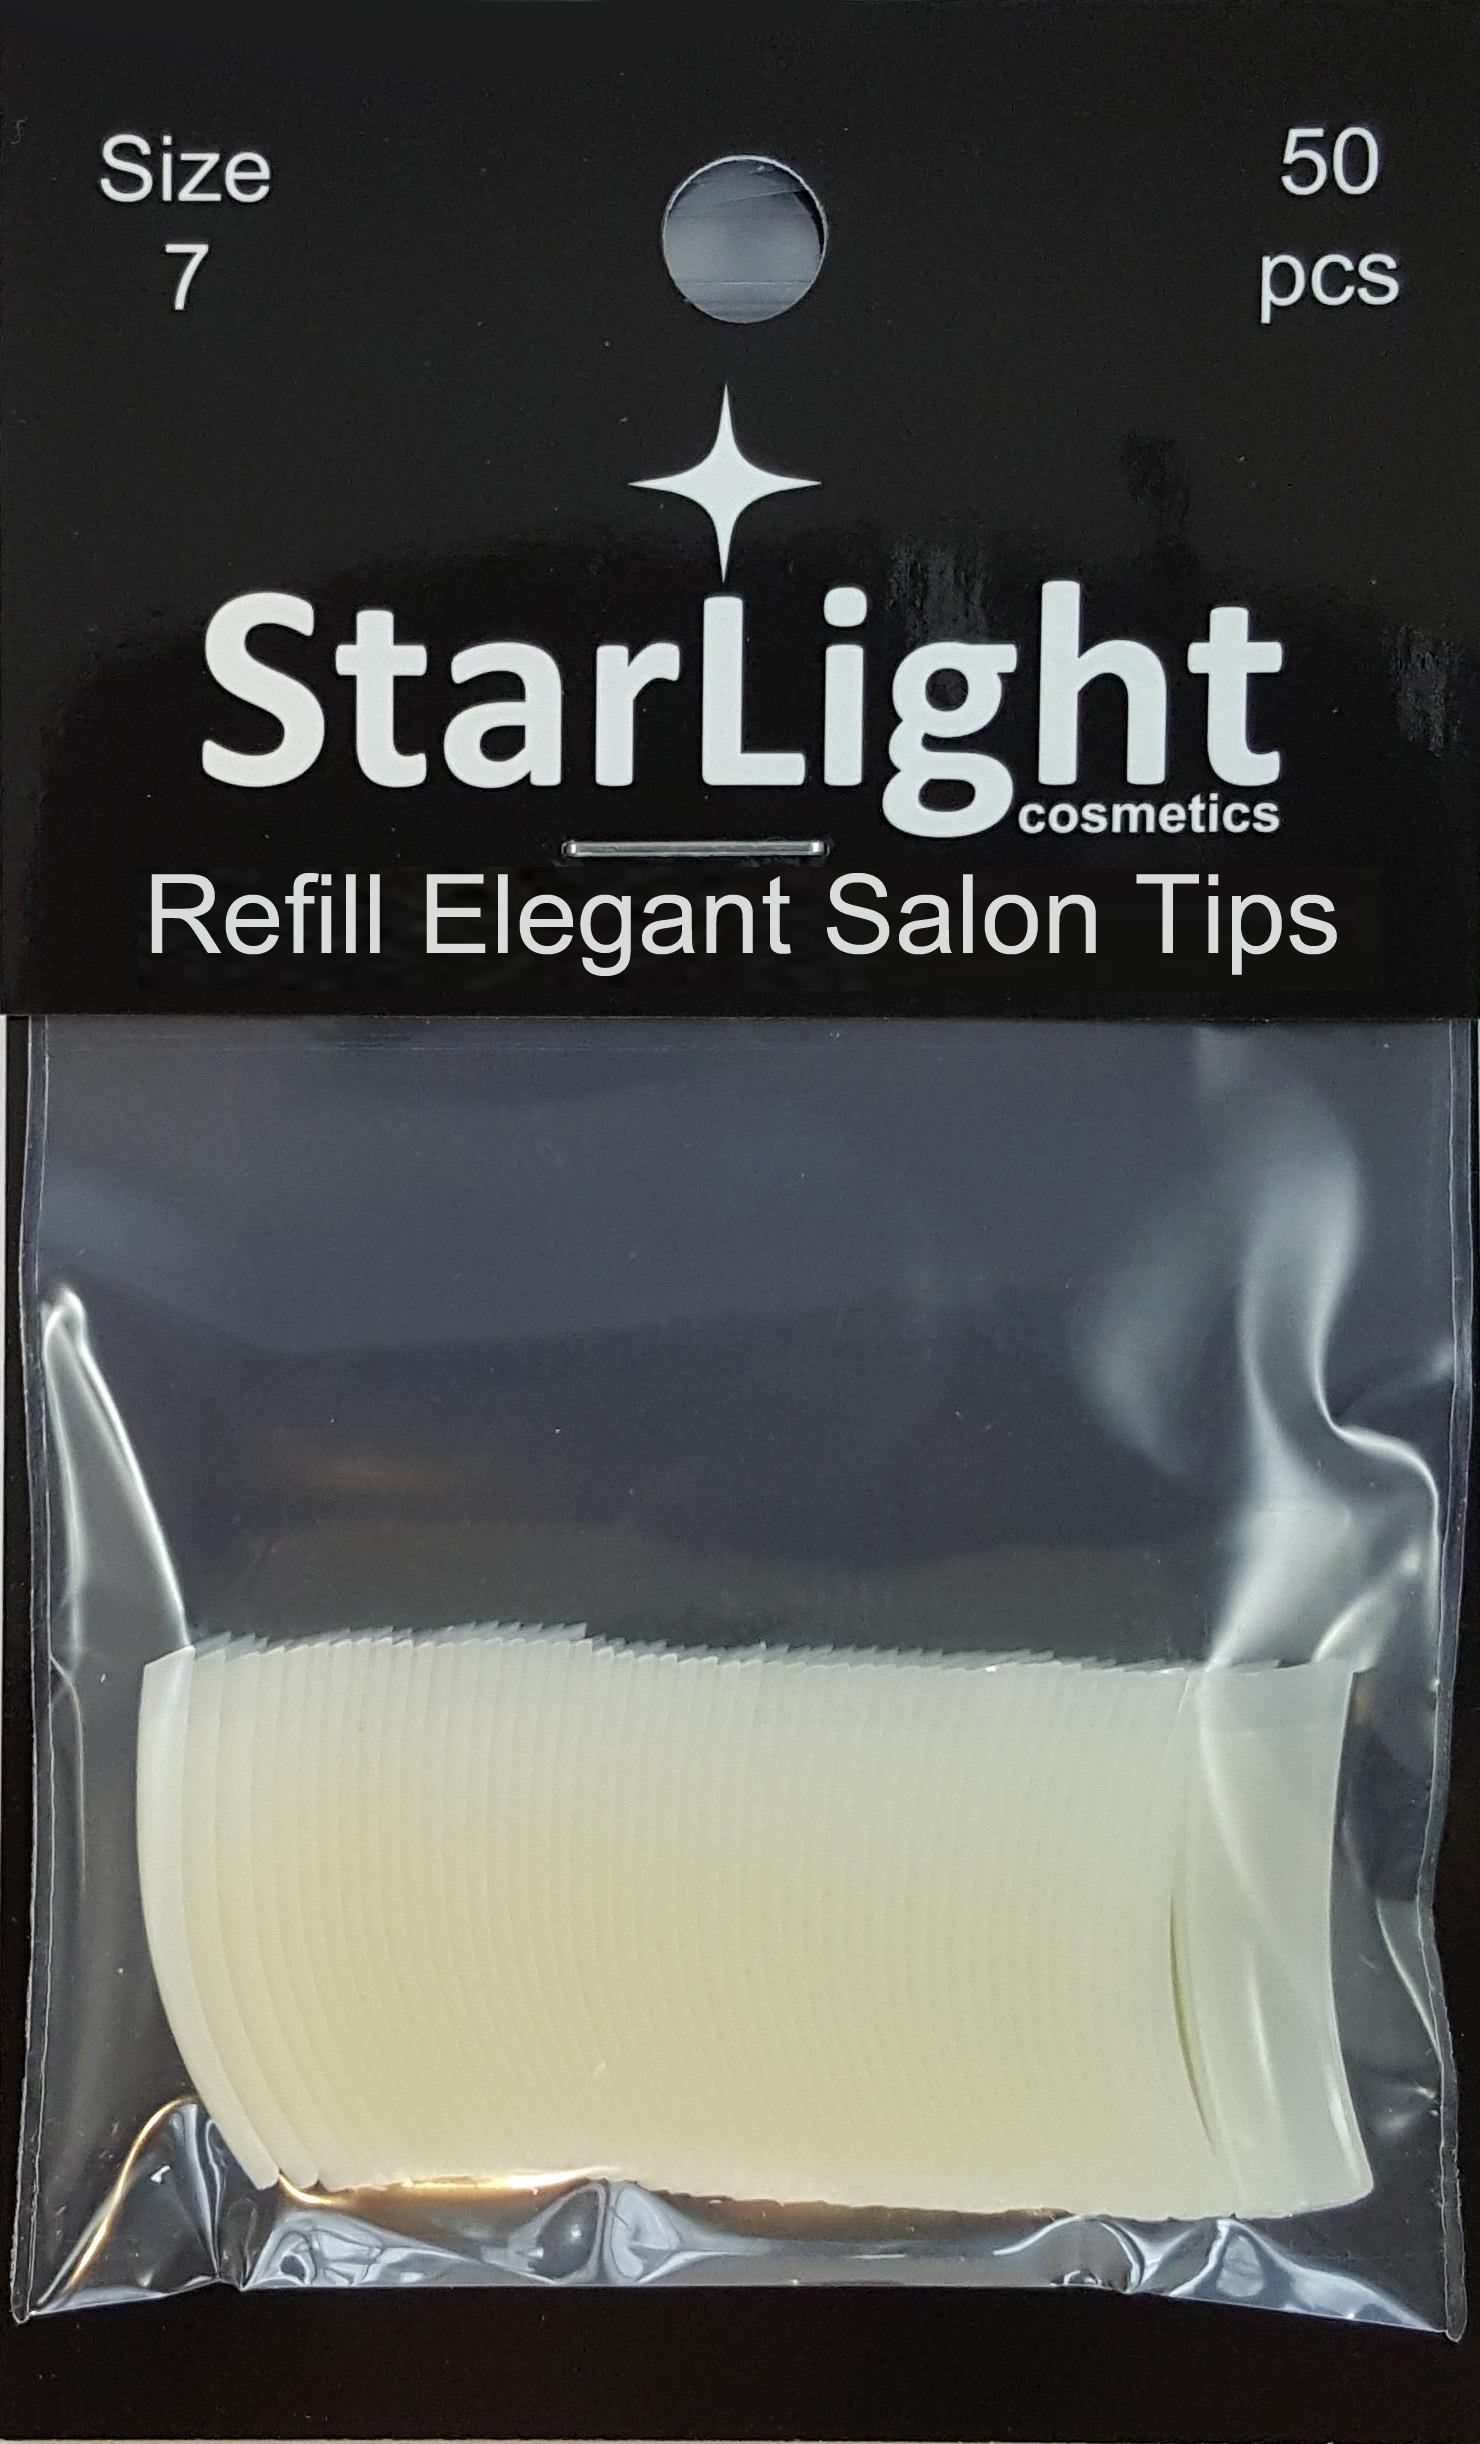 Naglar Elegant Salon Tips Refill - 50 st Storlek 7